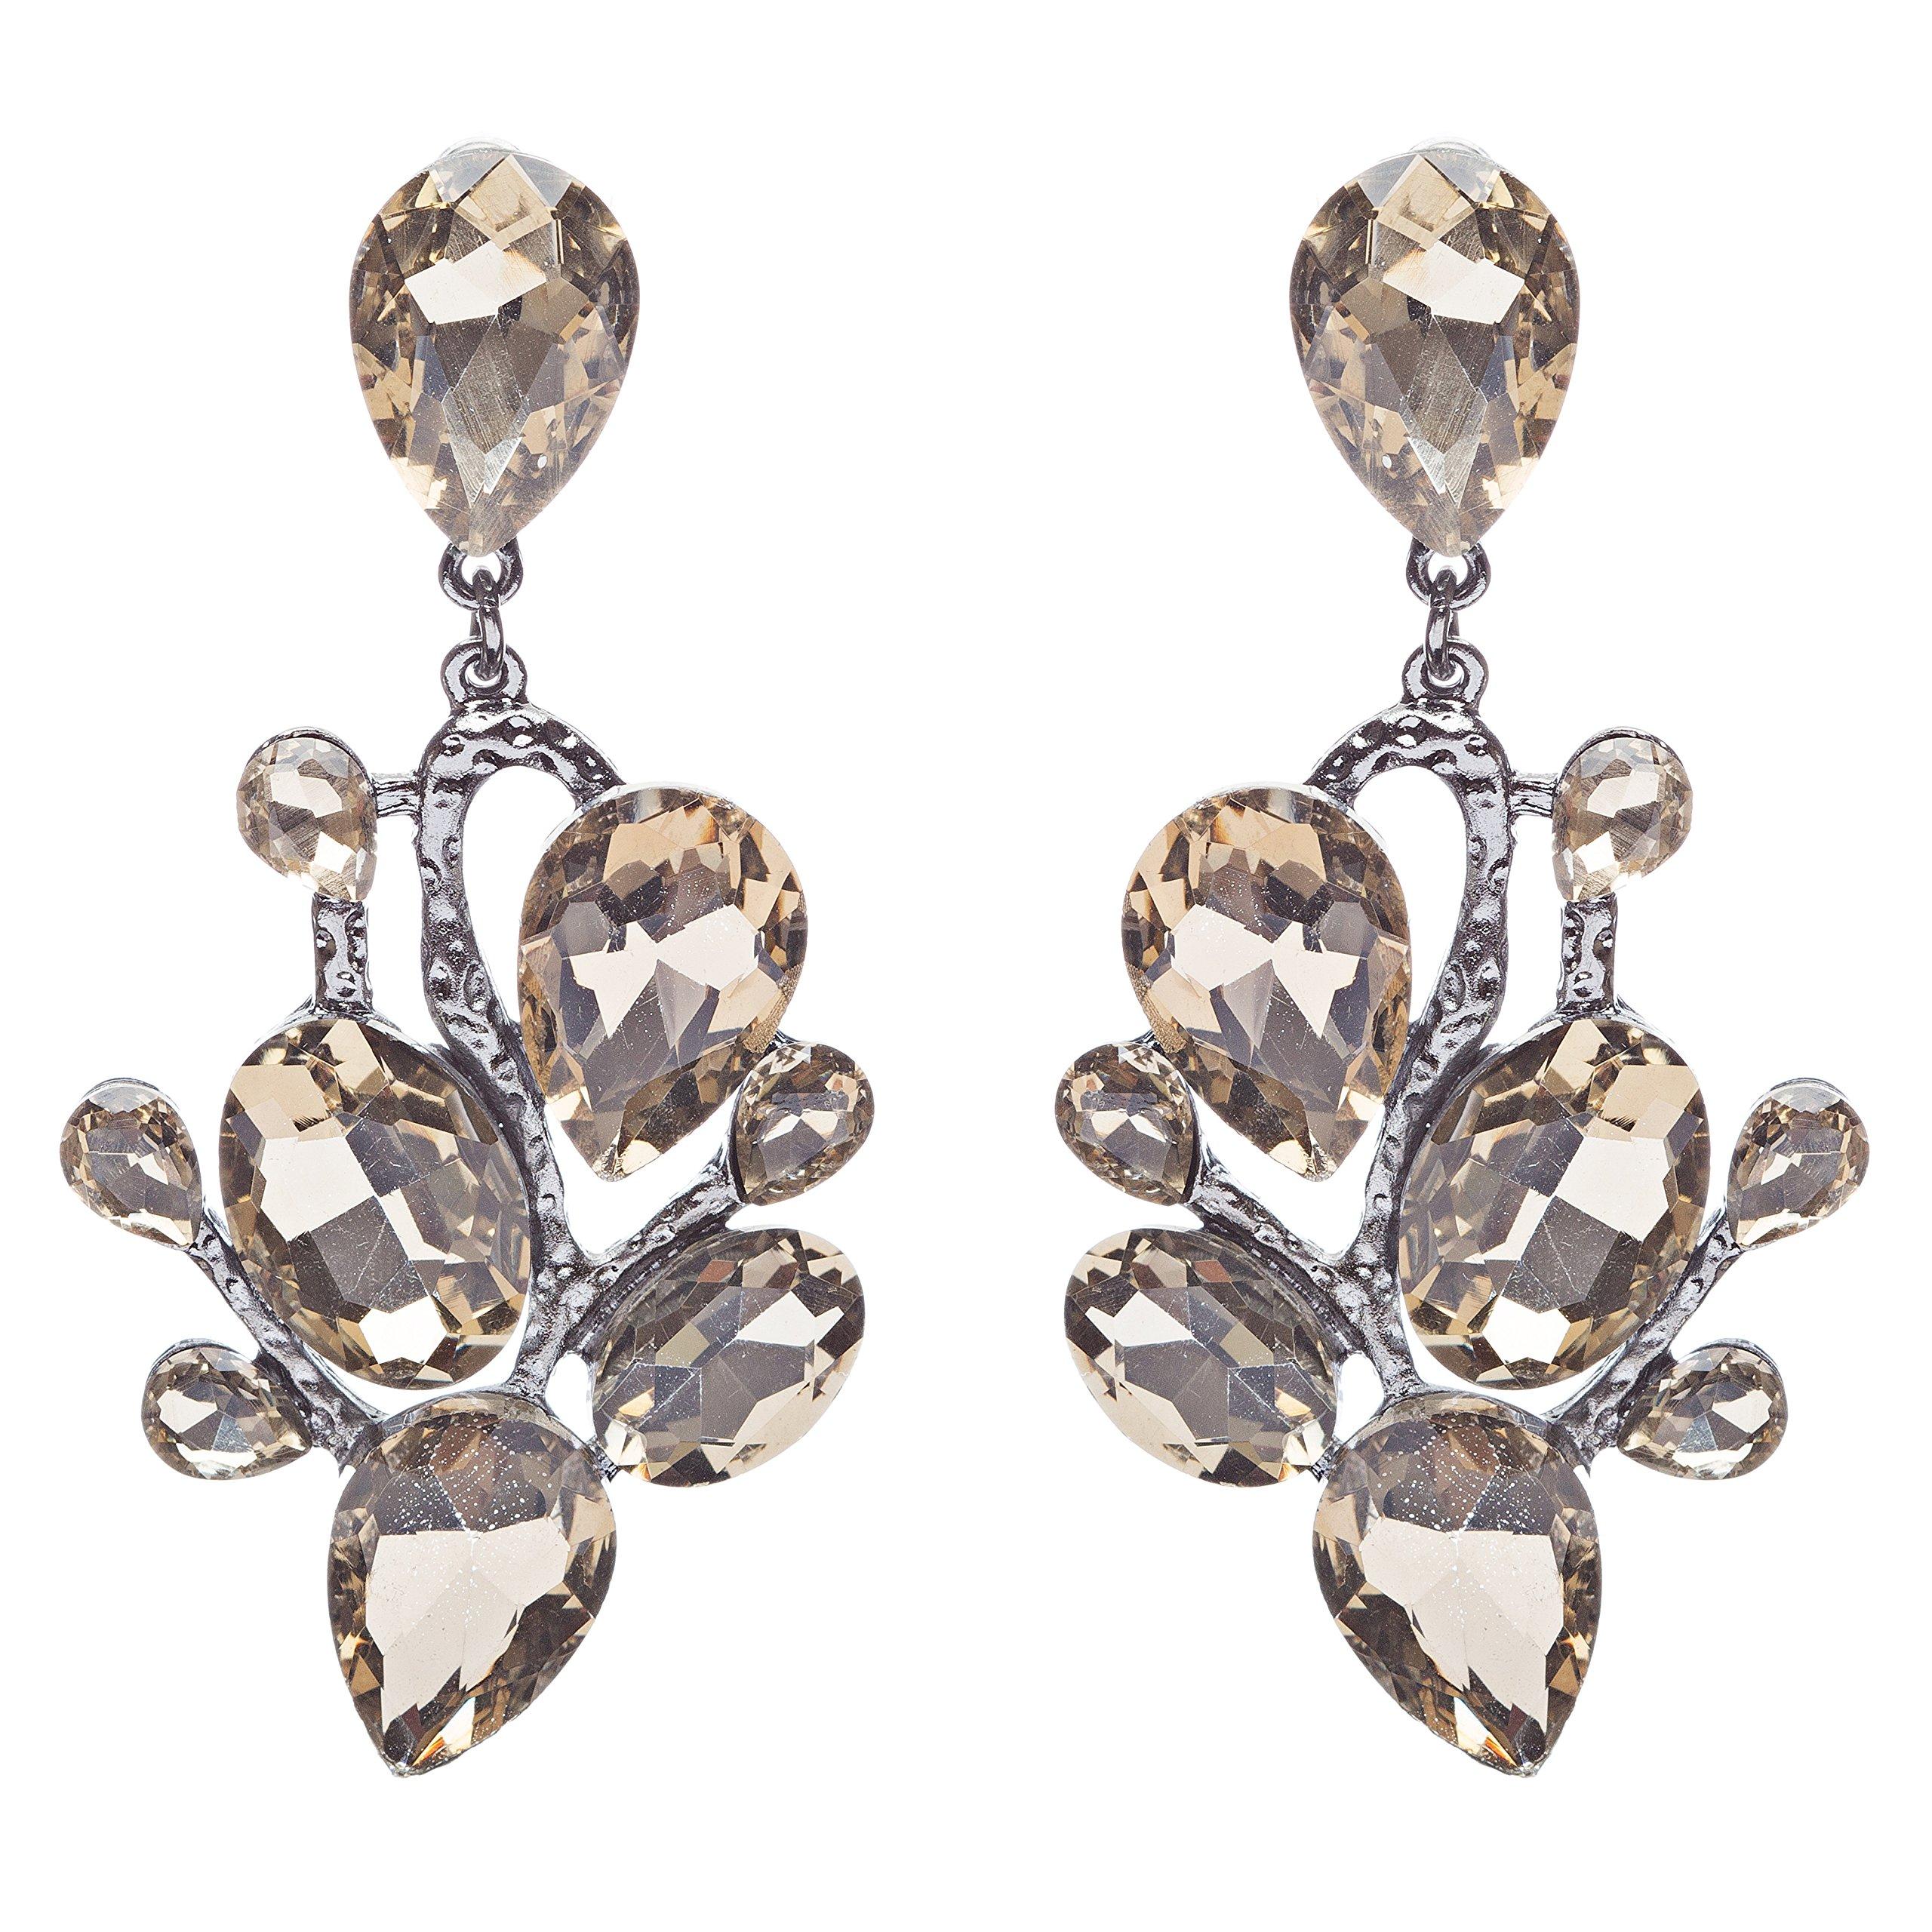 Beautiful Shiny Dazzling Multi Shapes Glass Stones Dangle Earrings E757 Brown